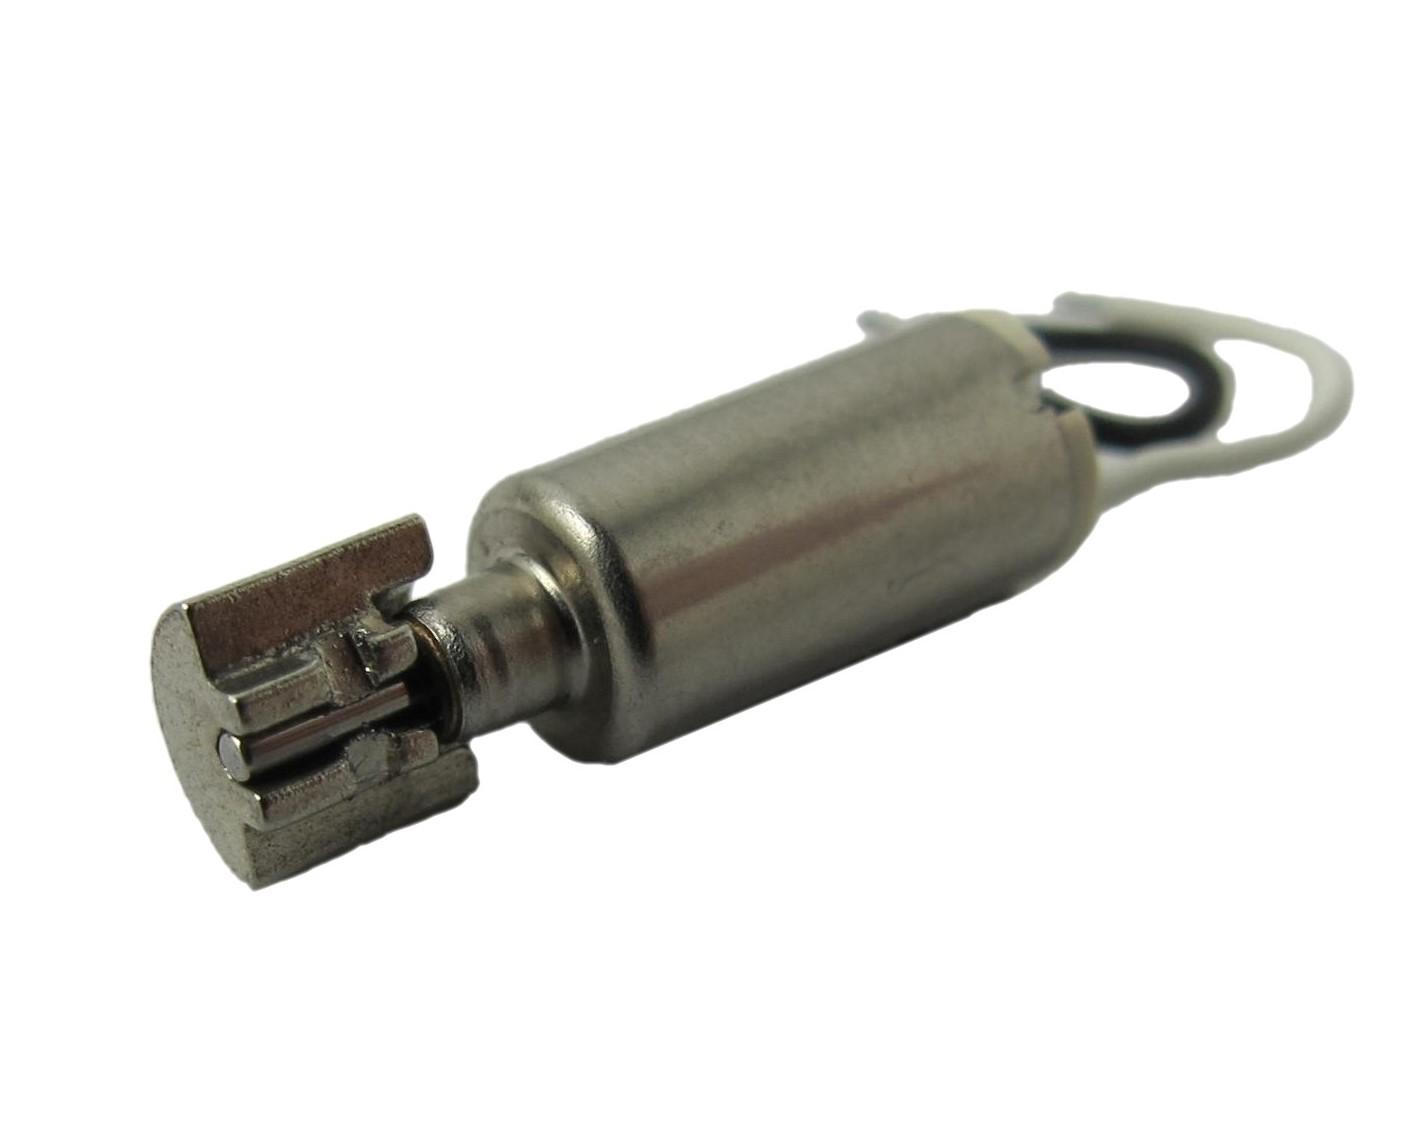 Z4TL2B0620043P Cylindrical Vibrator Motor